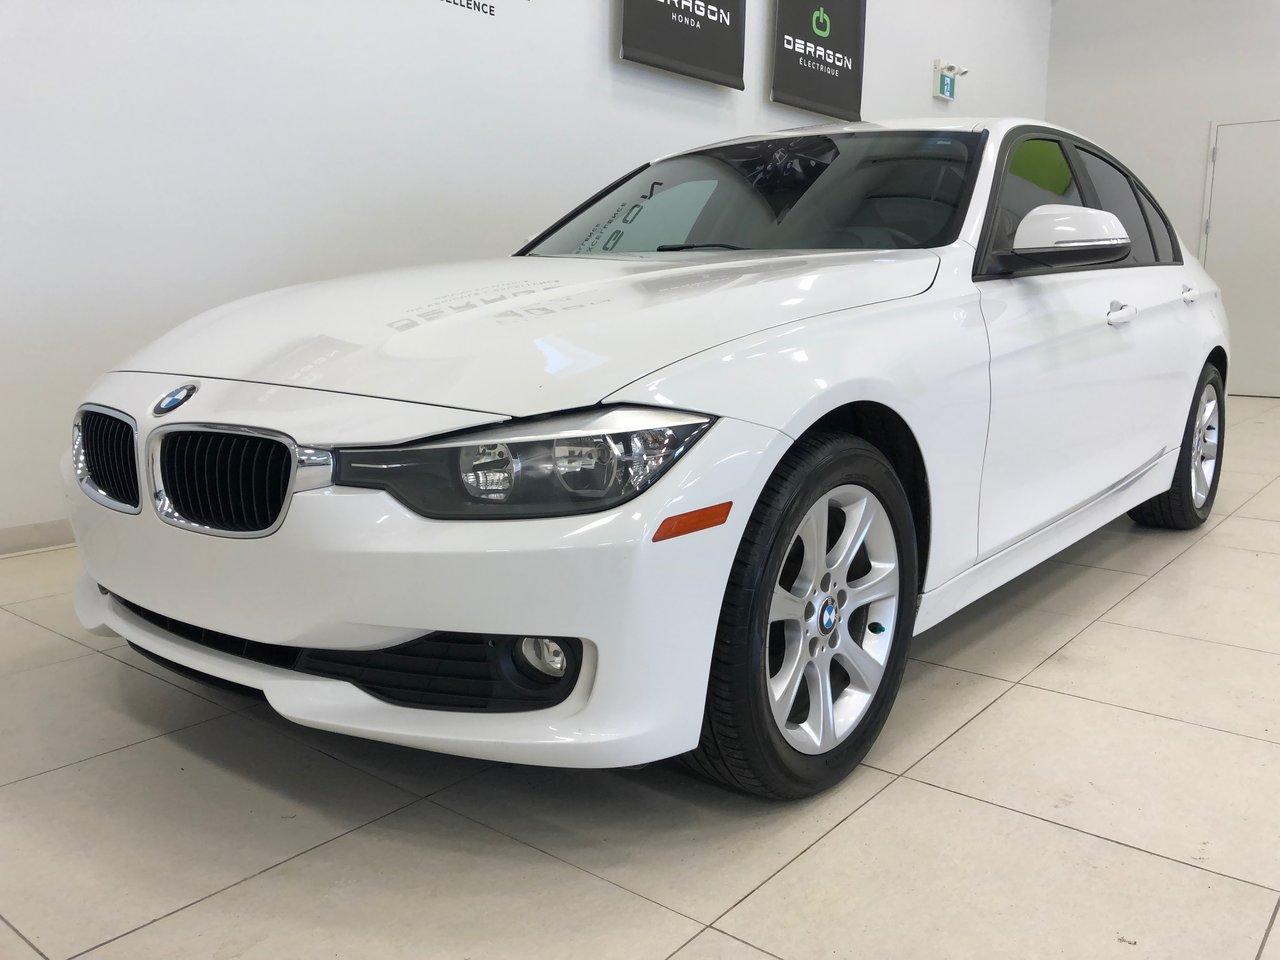 BMW Série 3 2014 320i XDRIVE, MÉMOIRE, SIÈGES CHAUFFANTS, 2.0T